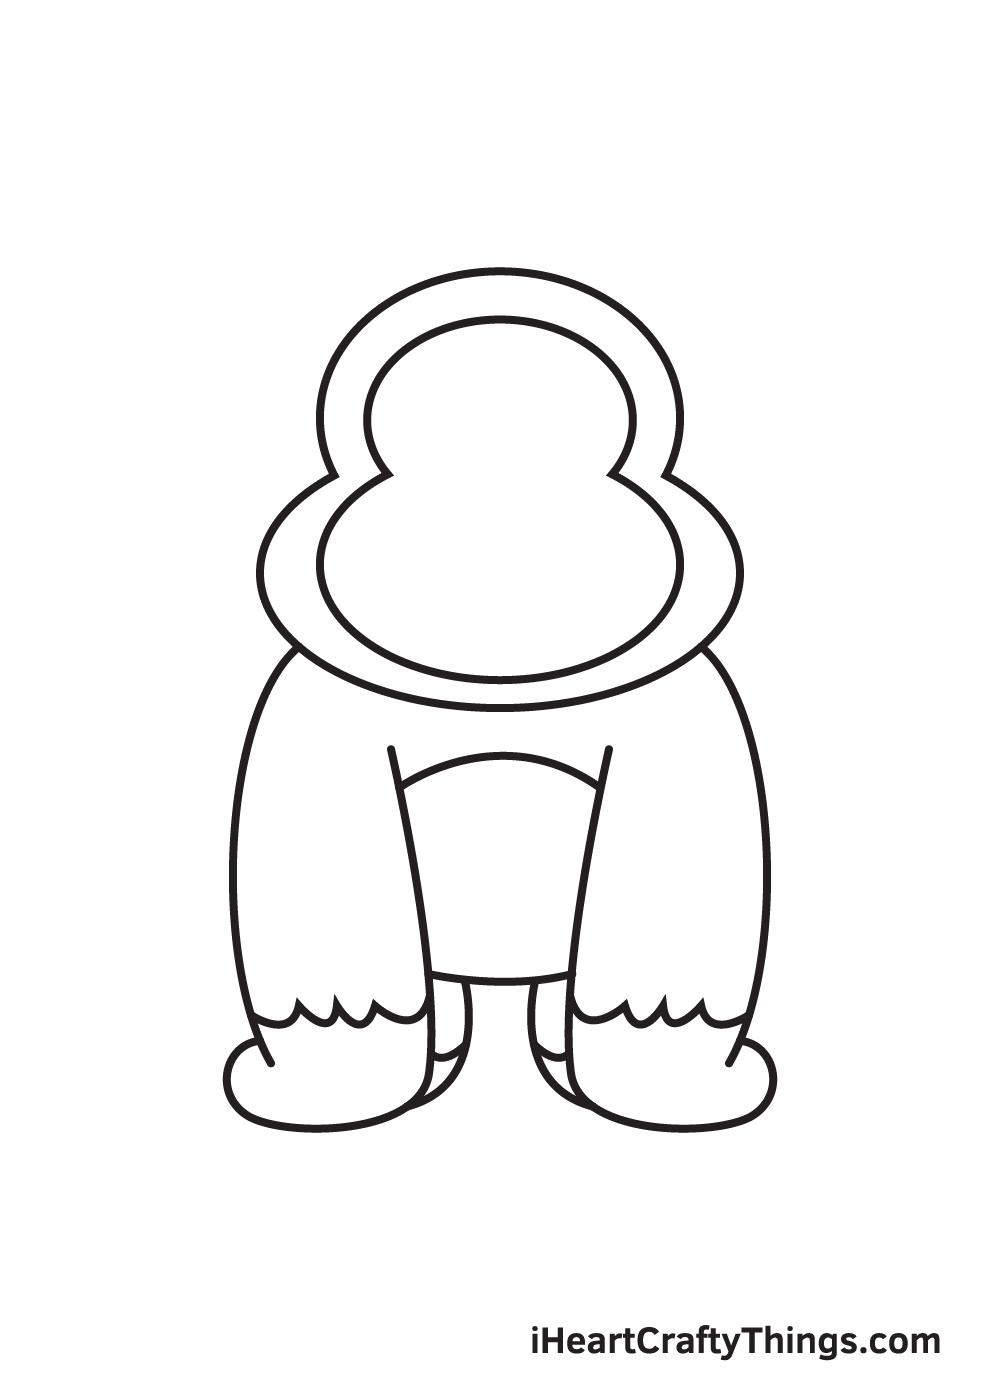 gorilla drawing - step 7